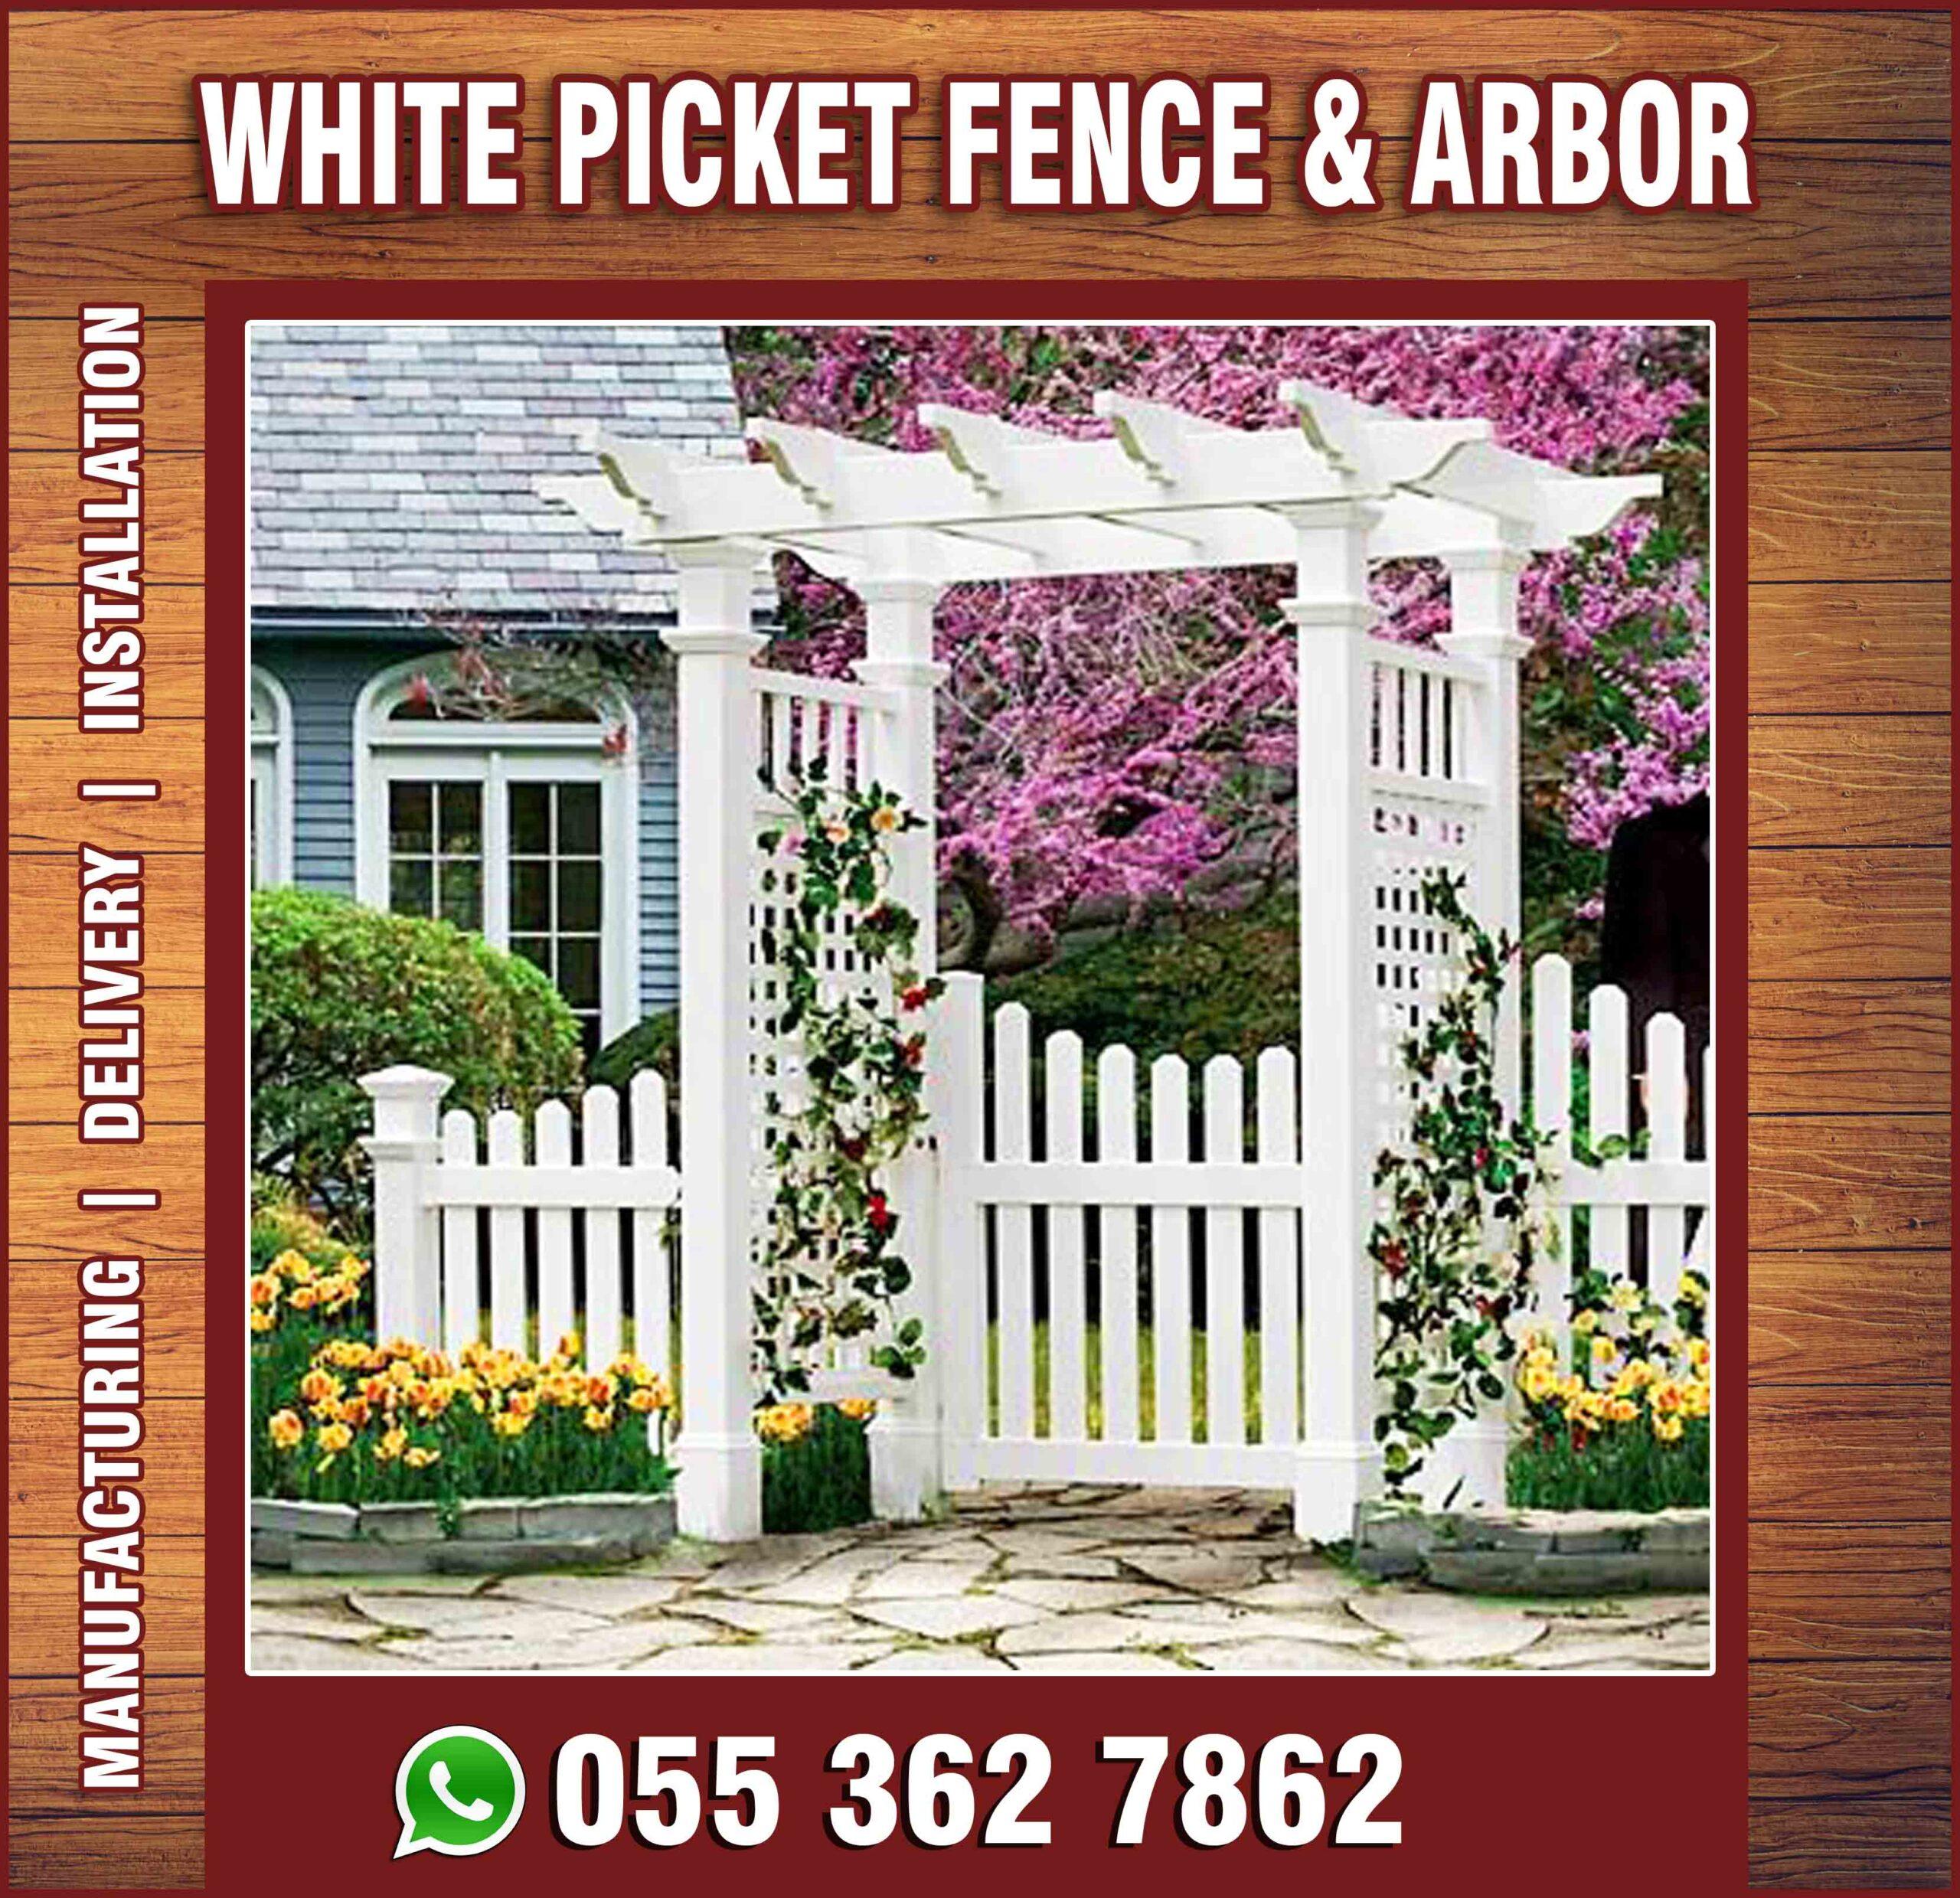 White Picket fences and Arbor in UAE.jpg